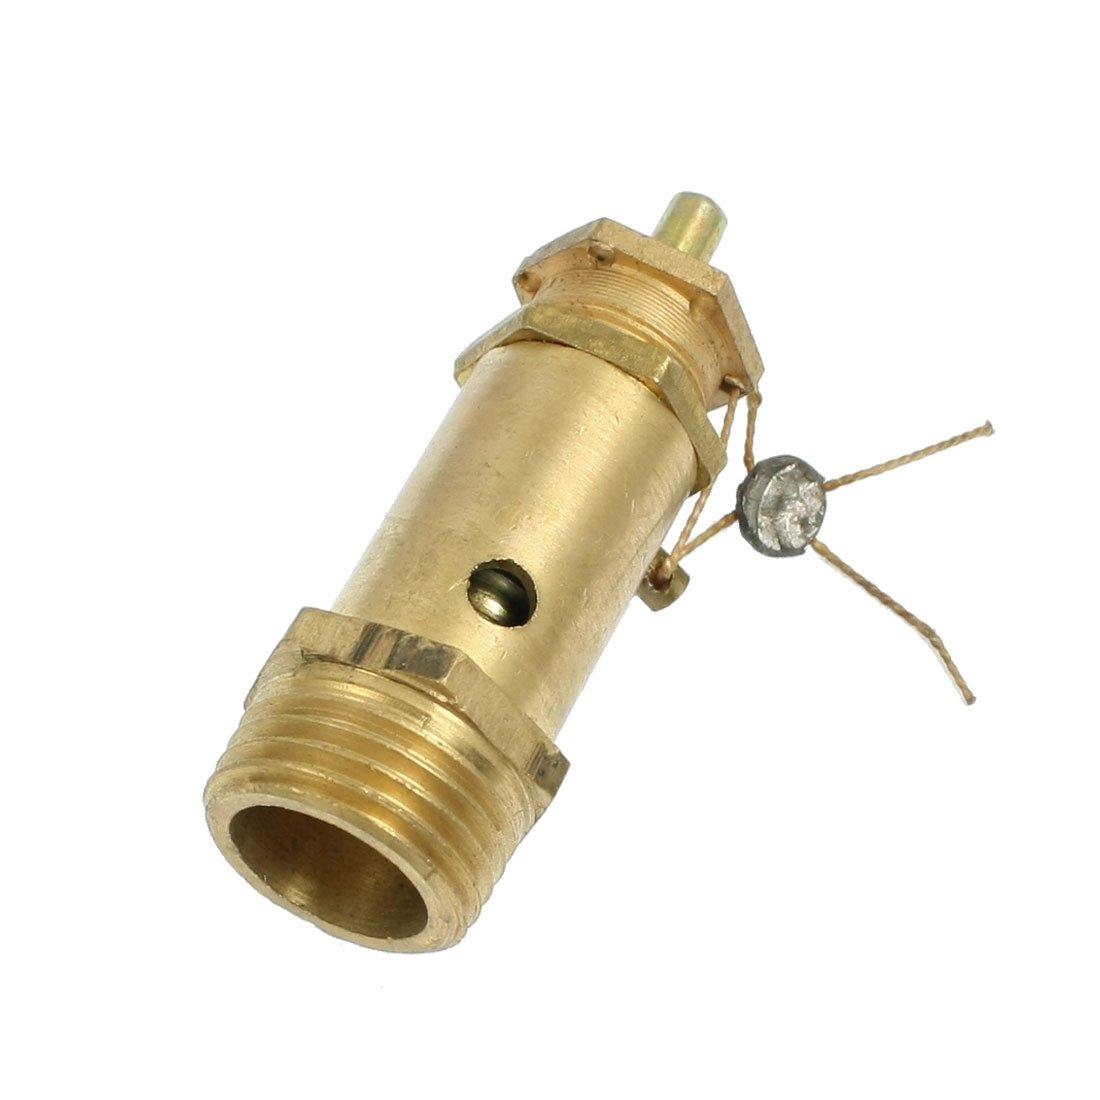 Lató n 1/2BSP Hilo Compresor Aire Seguridad Vá lvula Alivio Presió n 13Mpa Sourcingmap a12081300ux0371